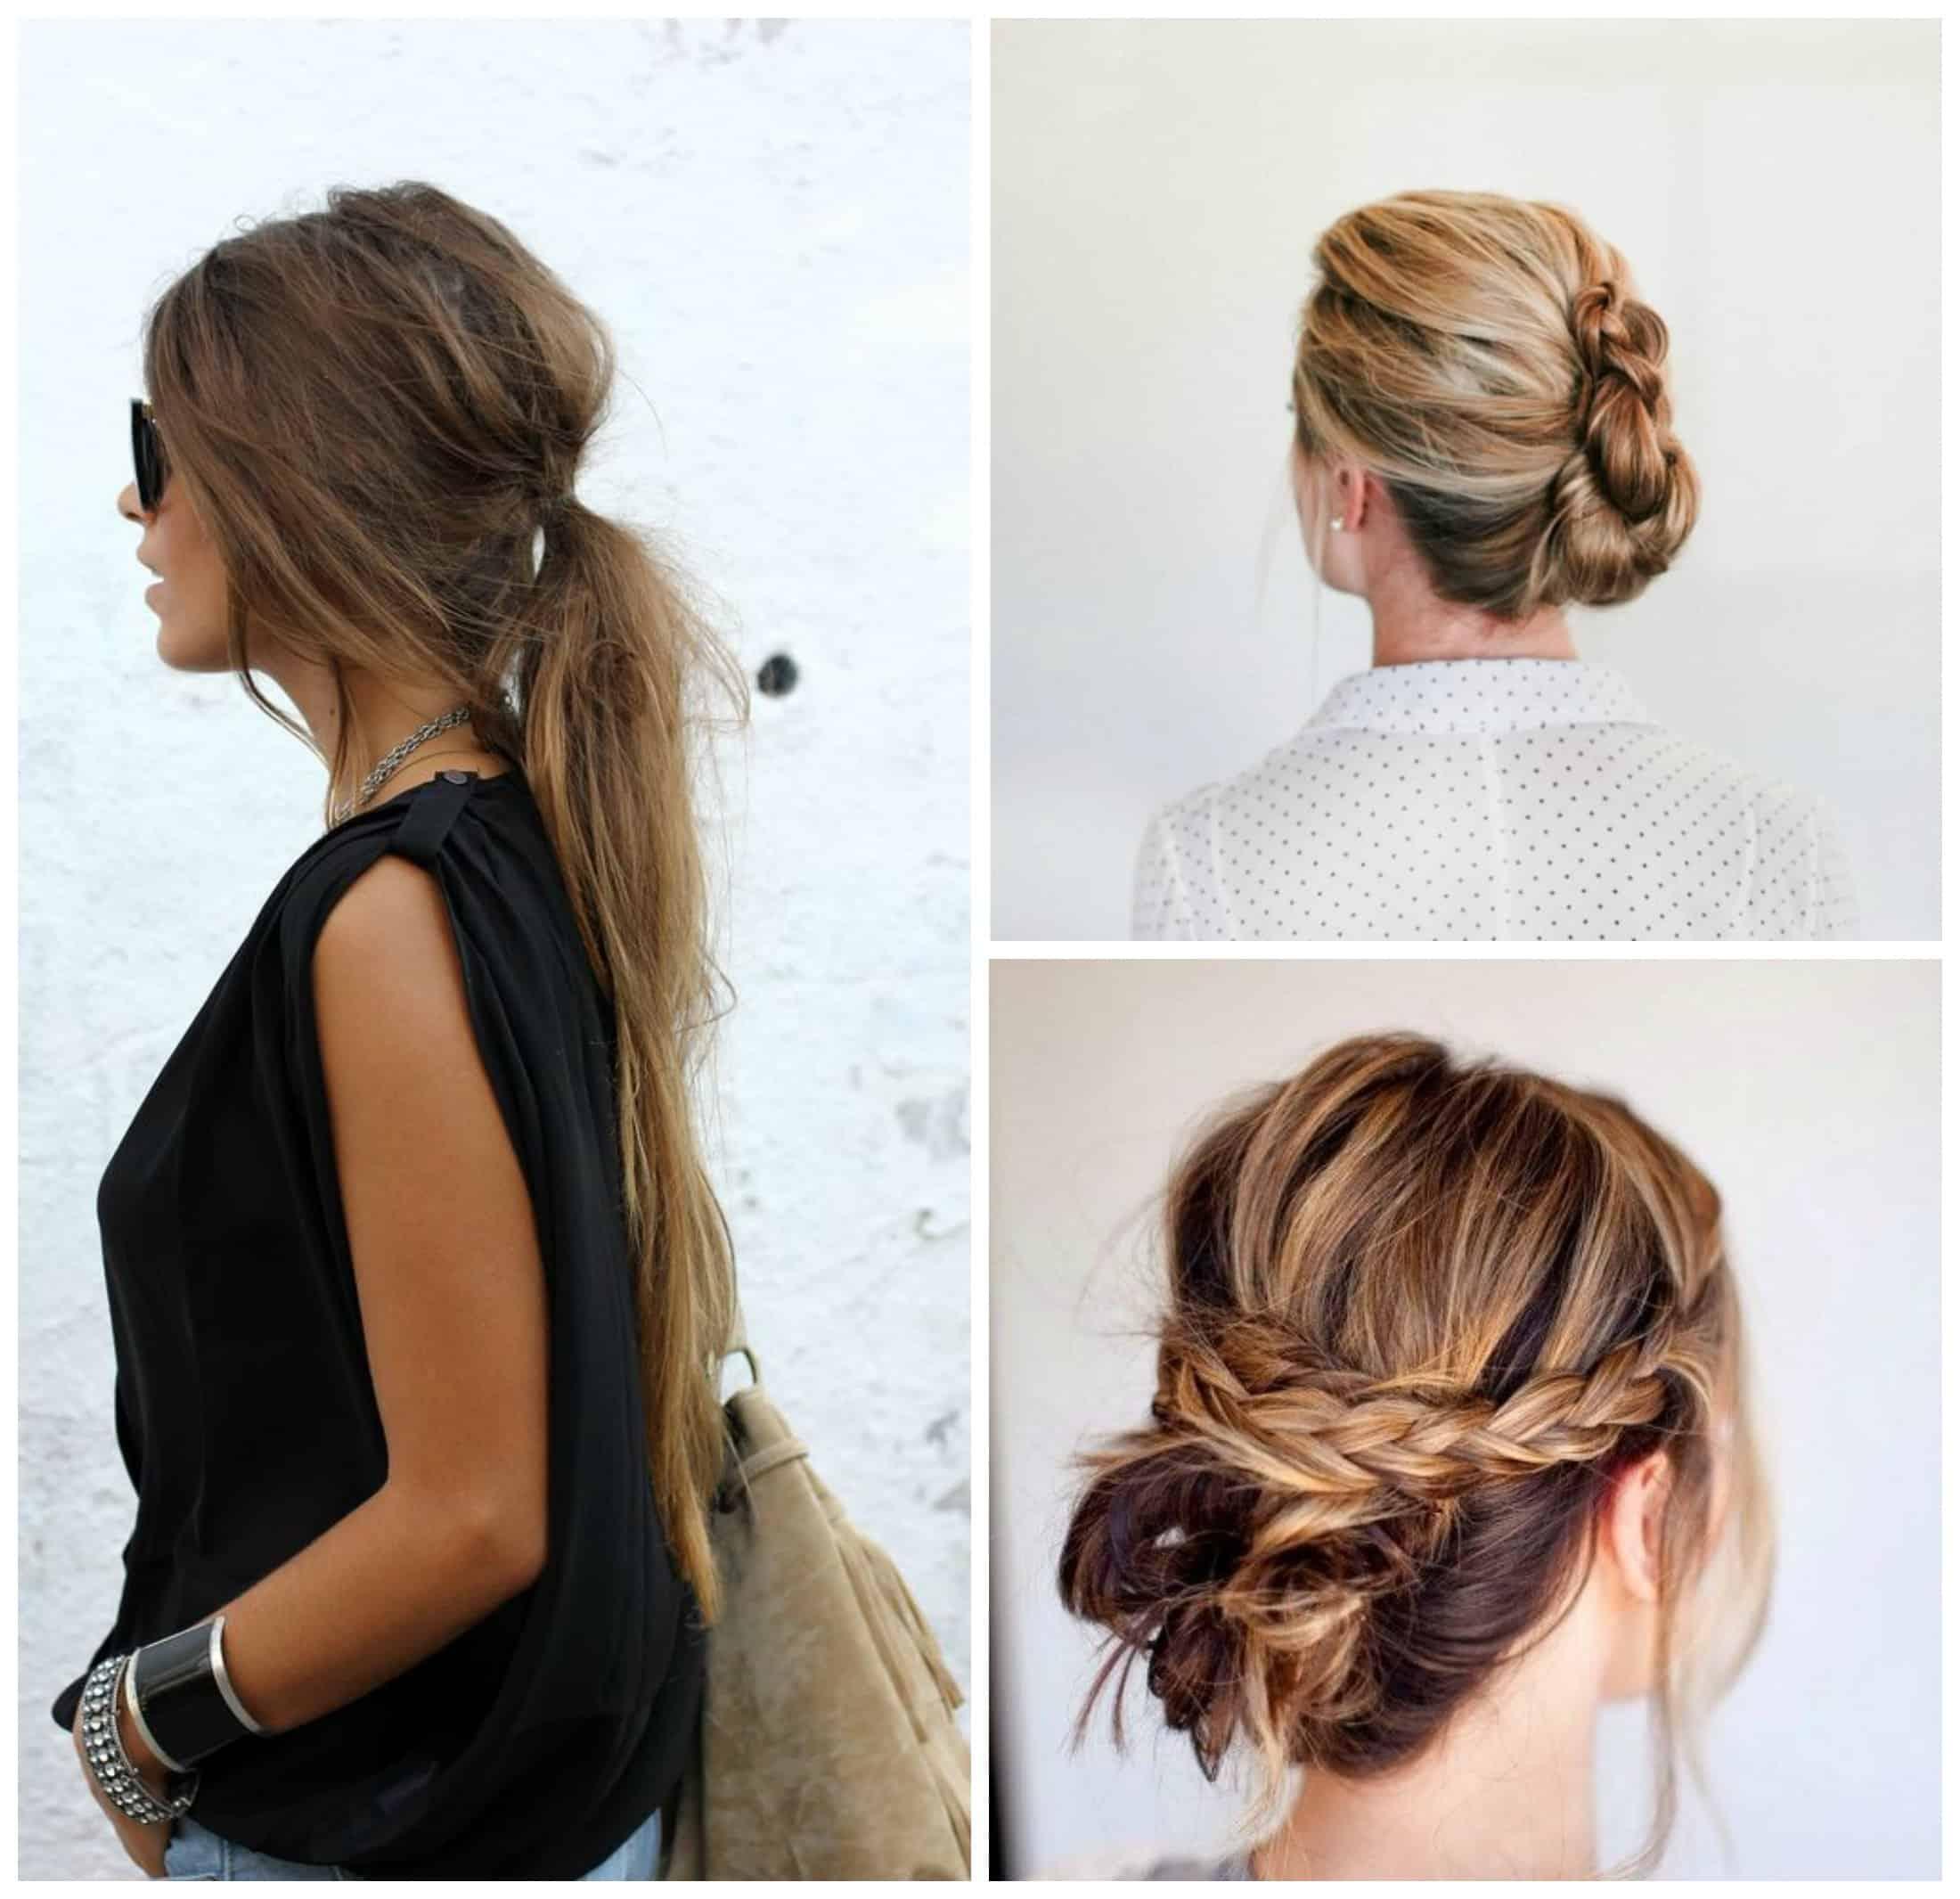 Peinados para cabello largo del diario